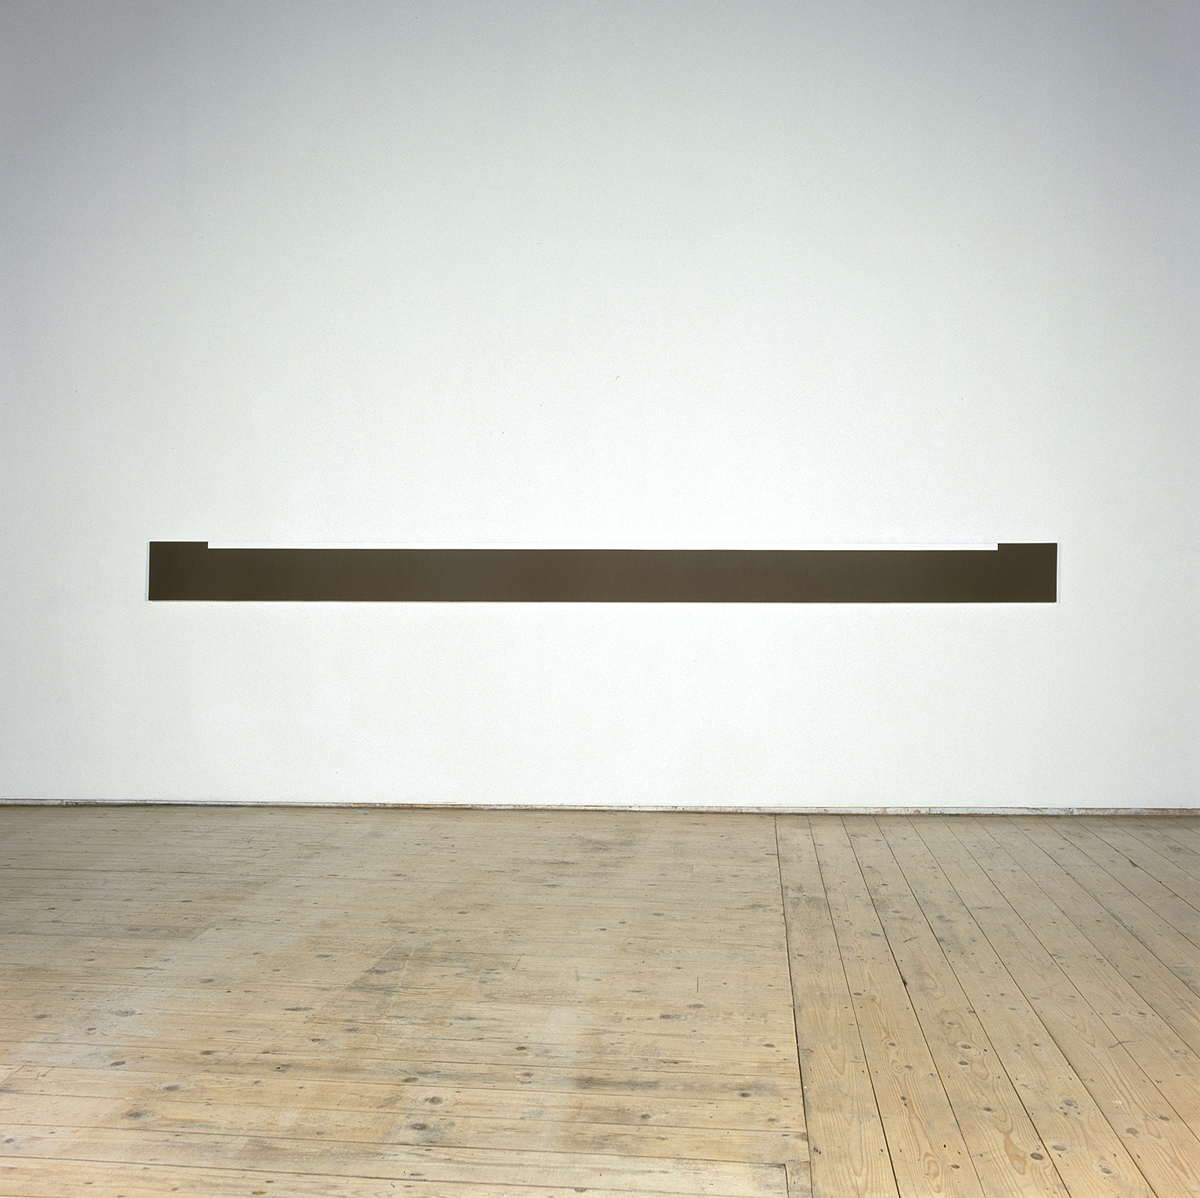 Untitled  1999  Acrylic on canvas  25 x 380 cm